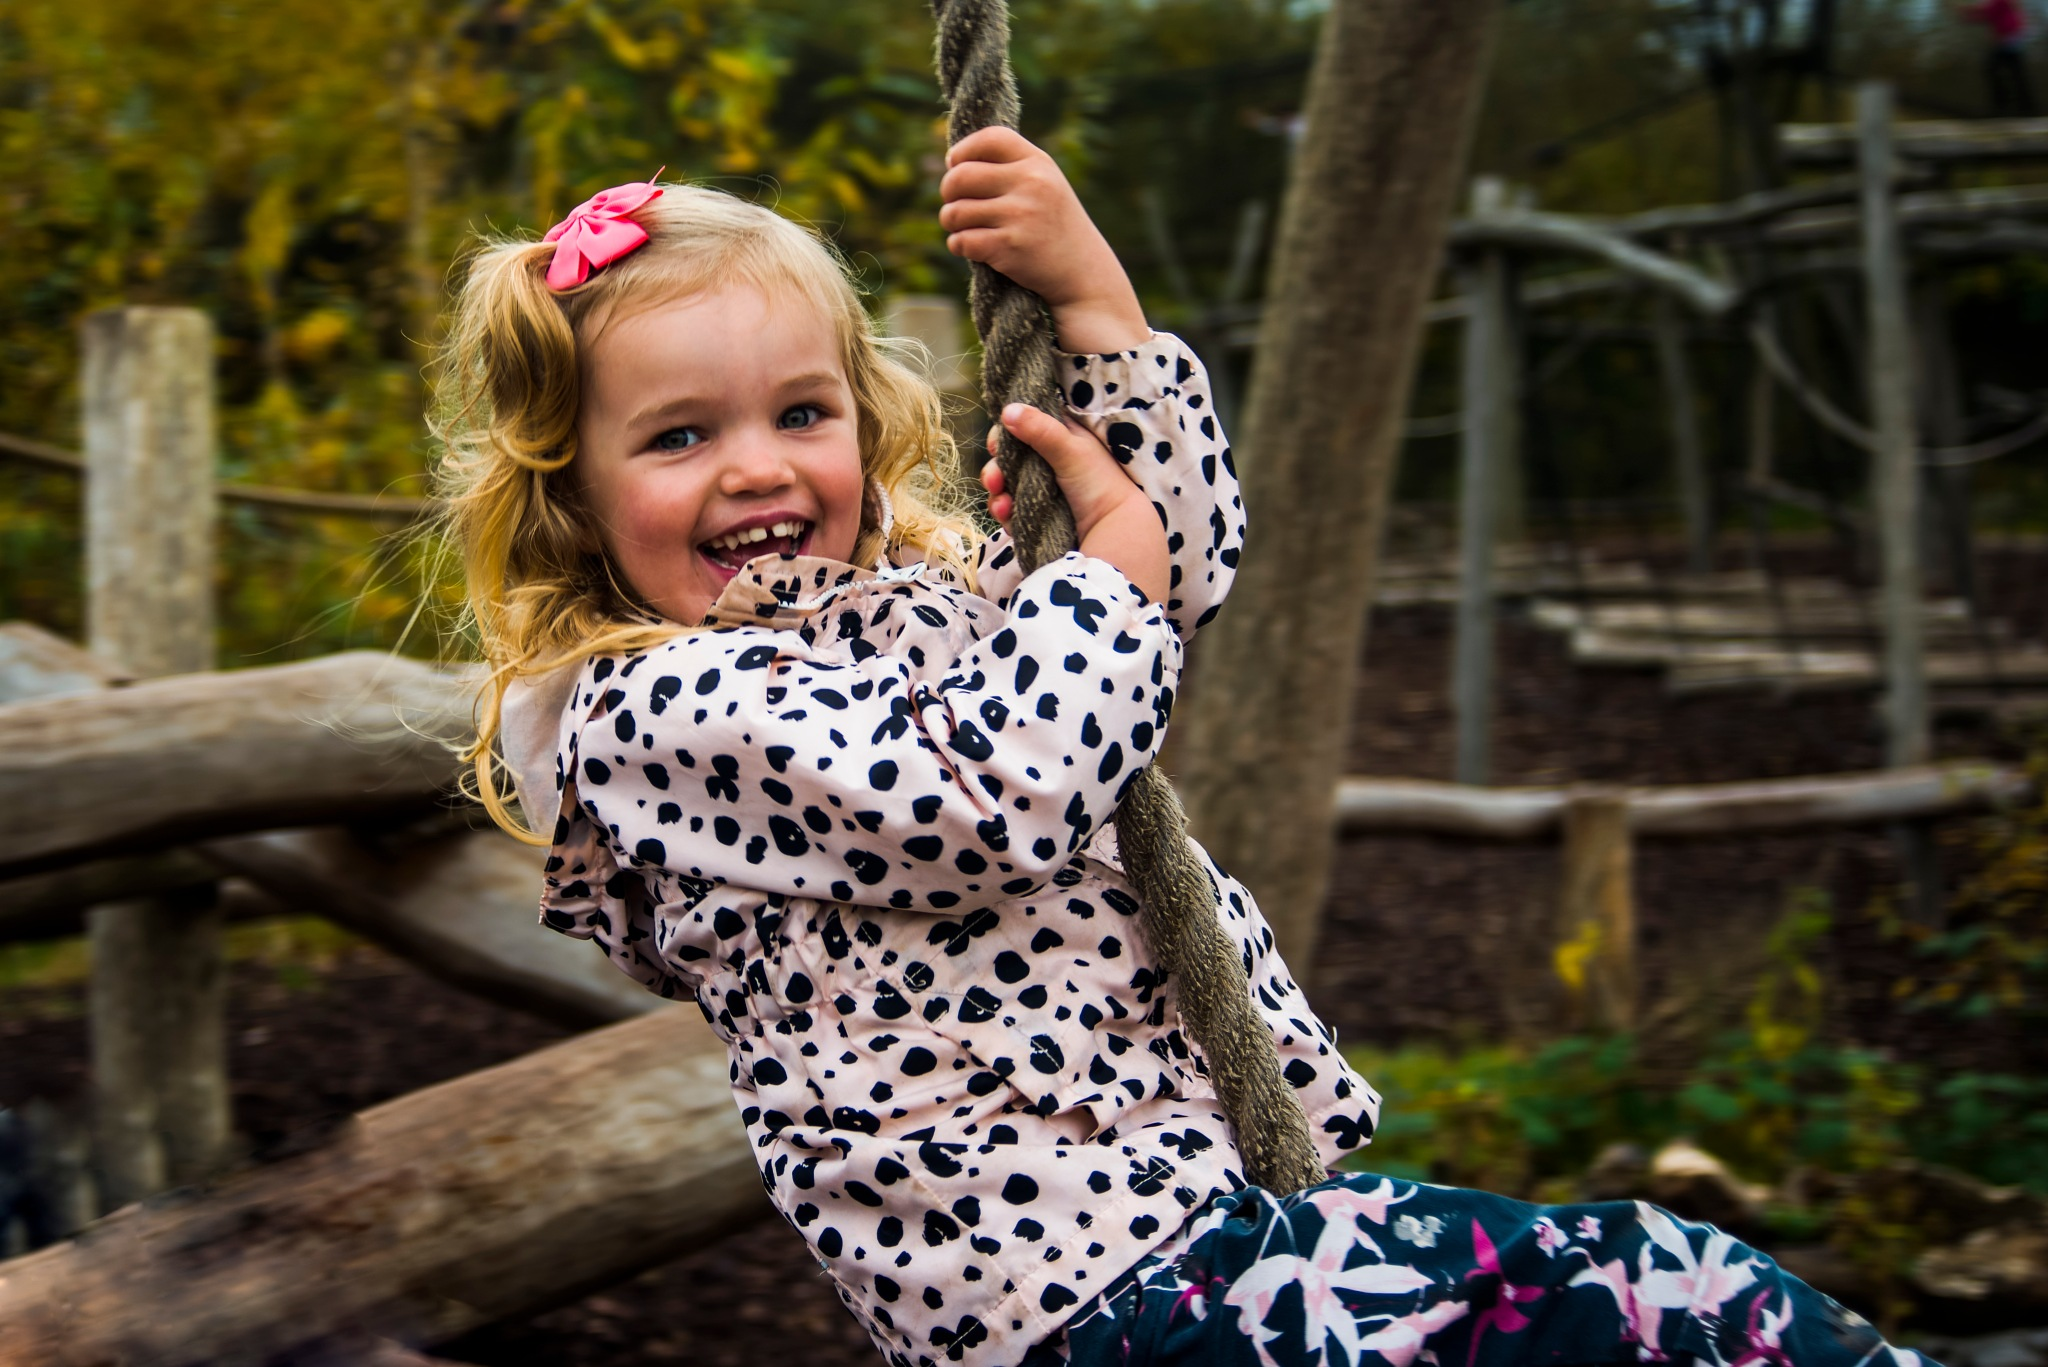 Sofia on a swing by Steen Skov